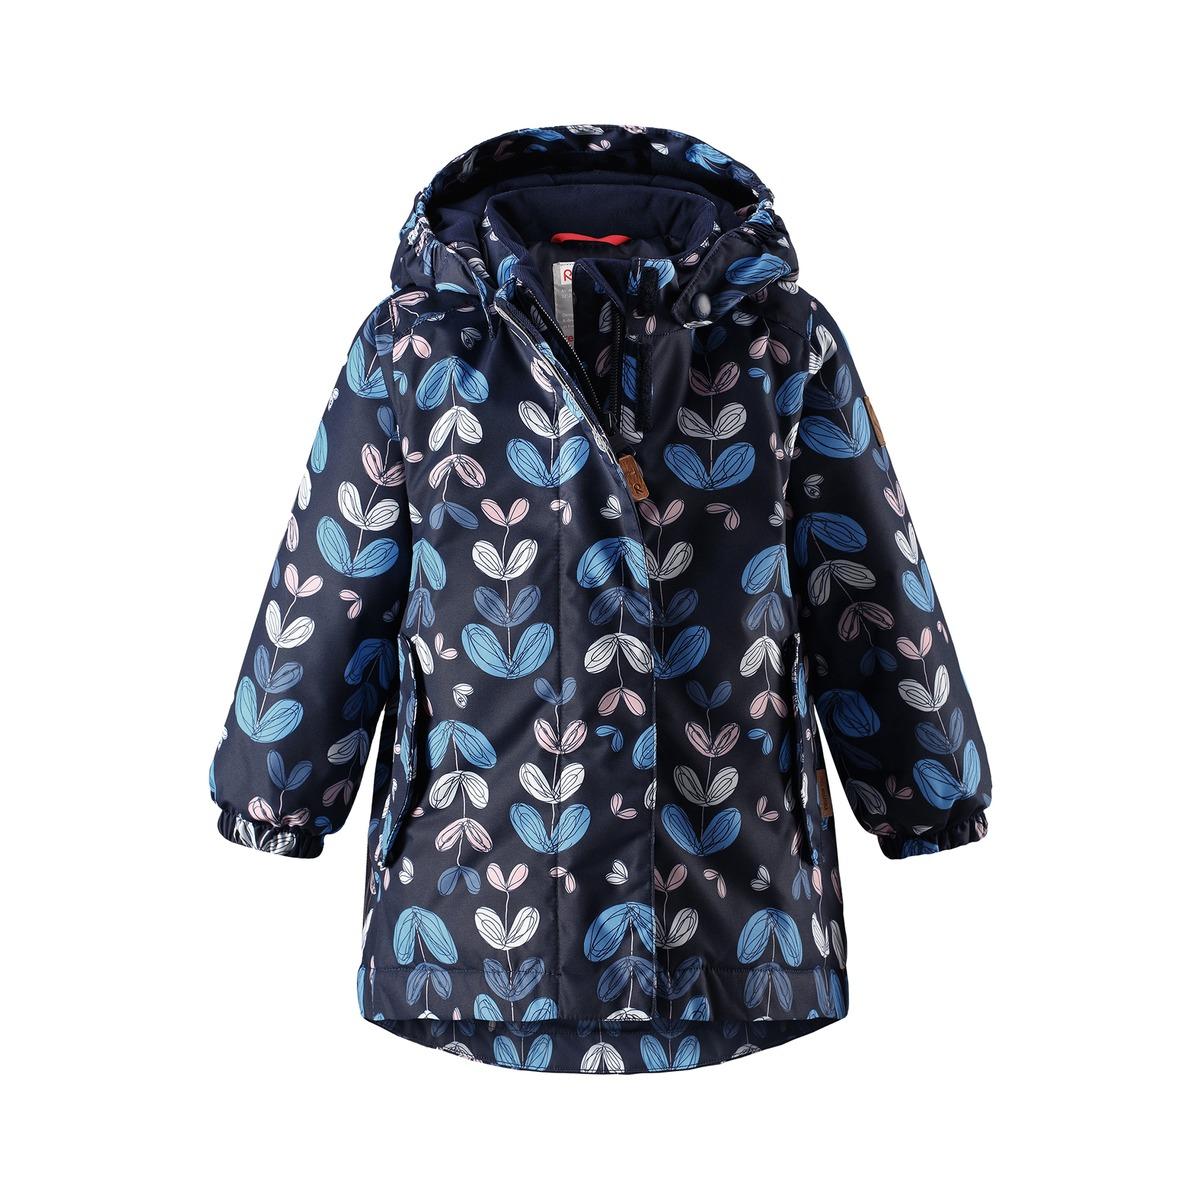 78618347 jacket vinterjakke barn available via PricePi.com. Shop the entire ...